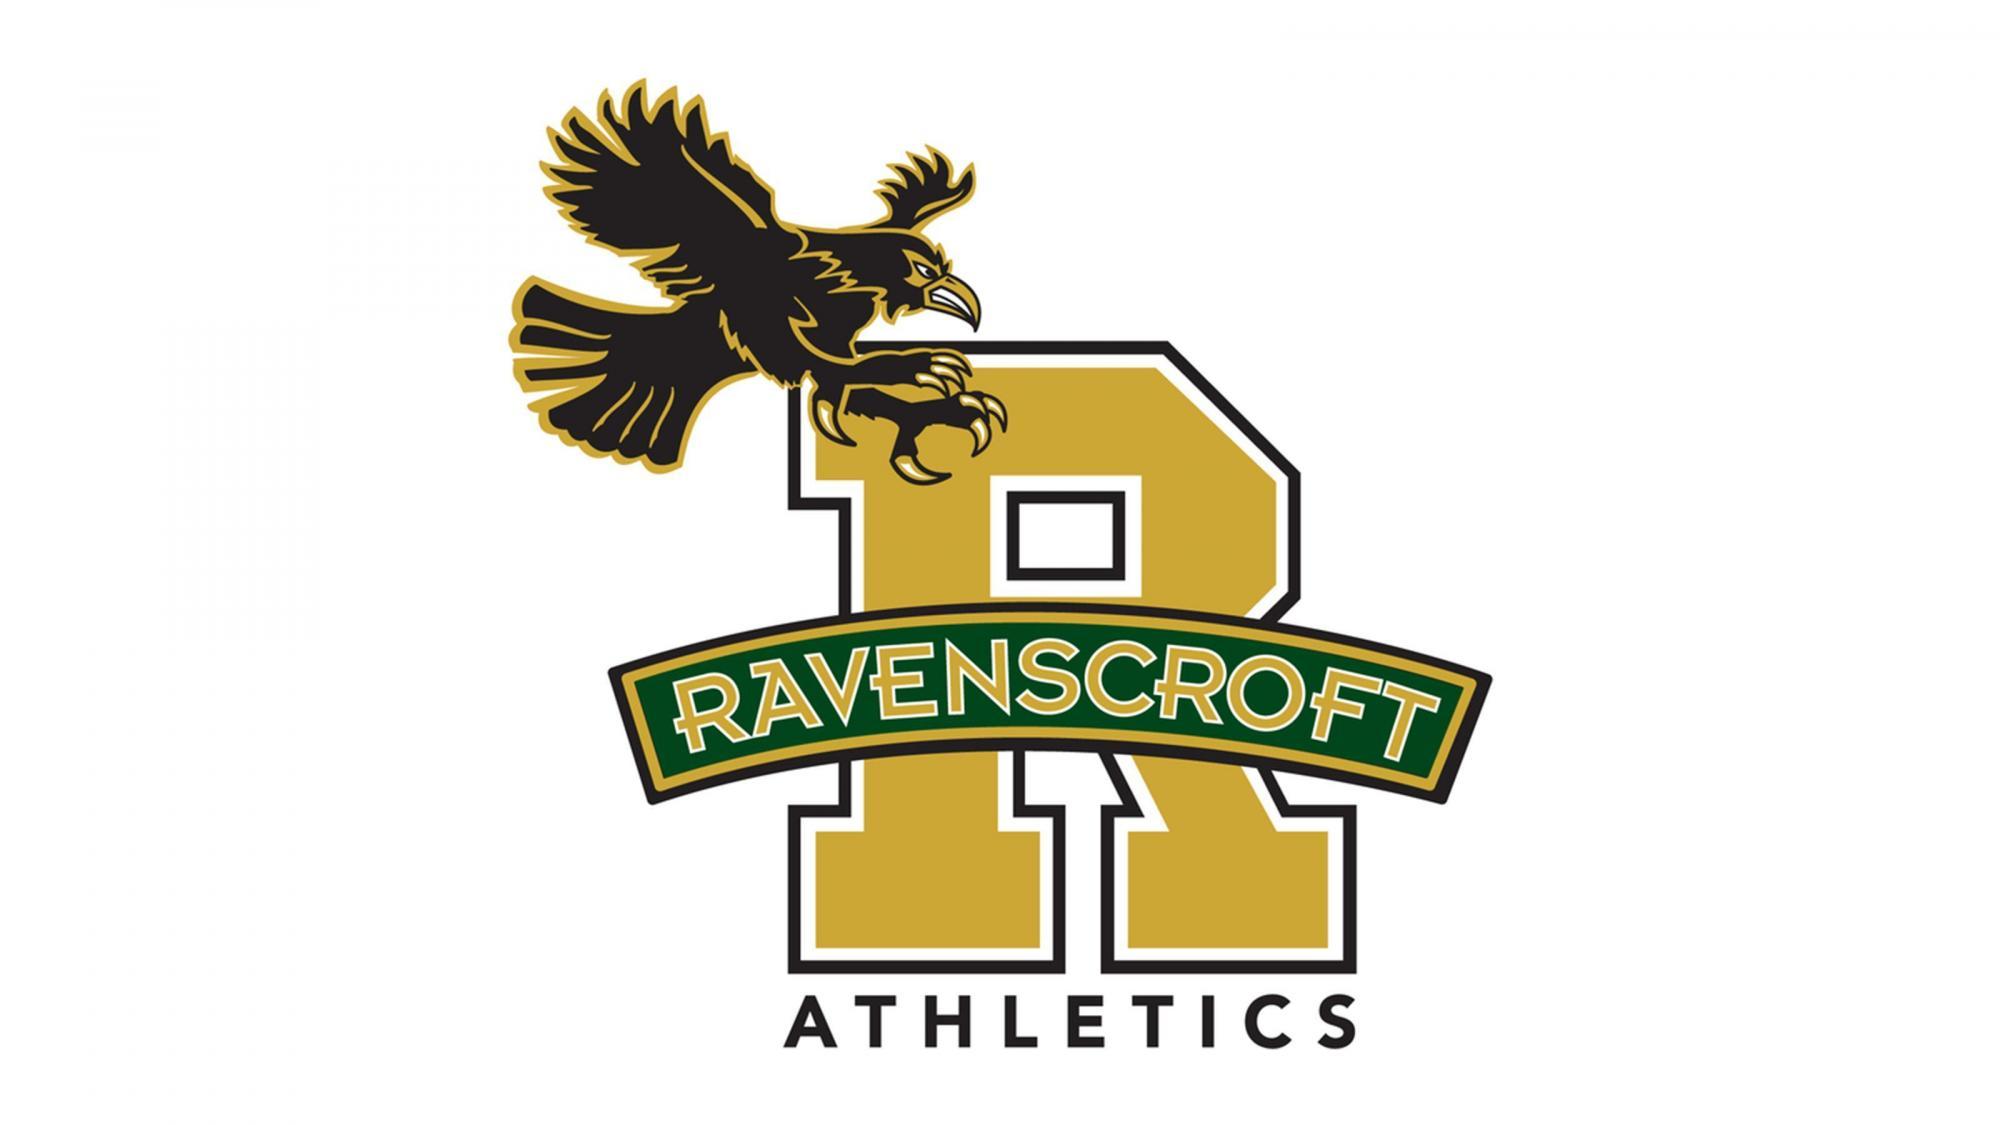 Ravenscroft School logo